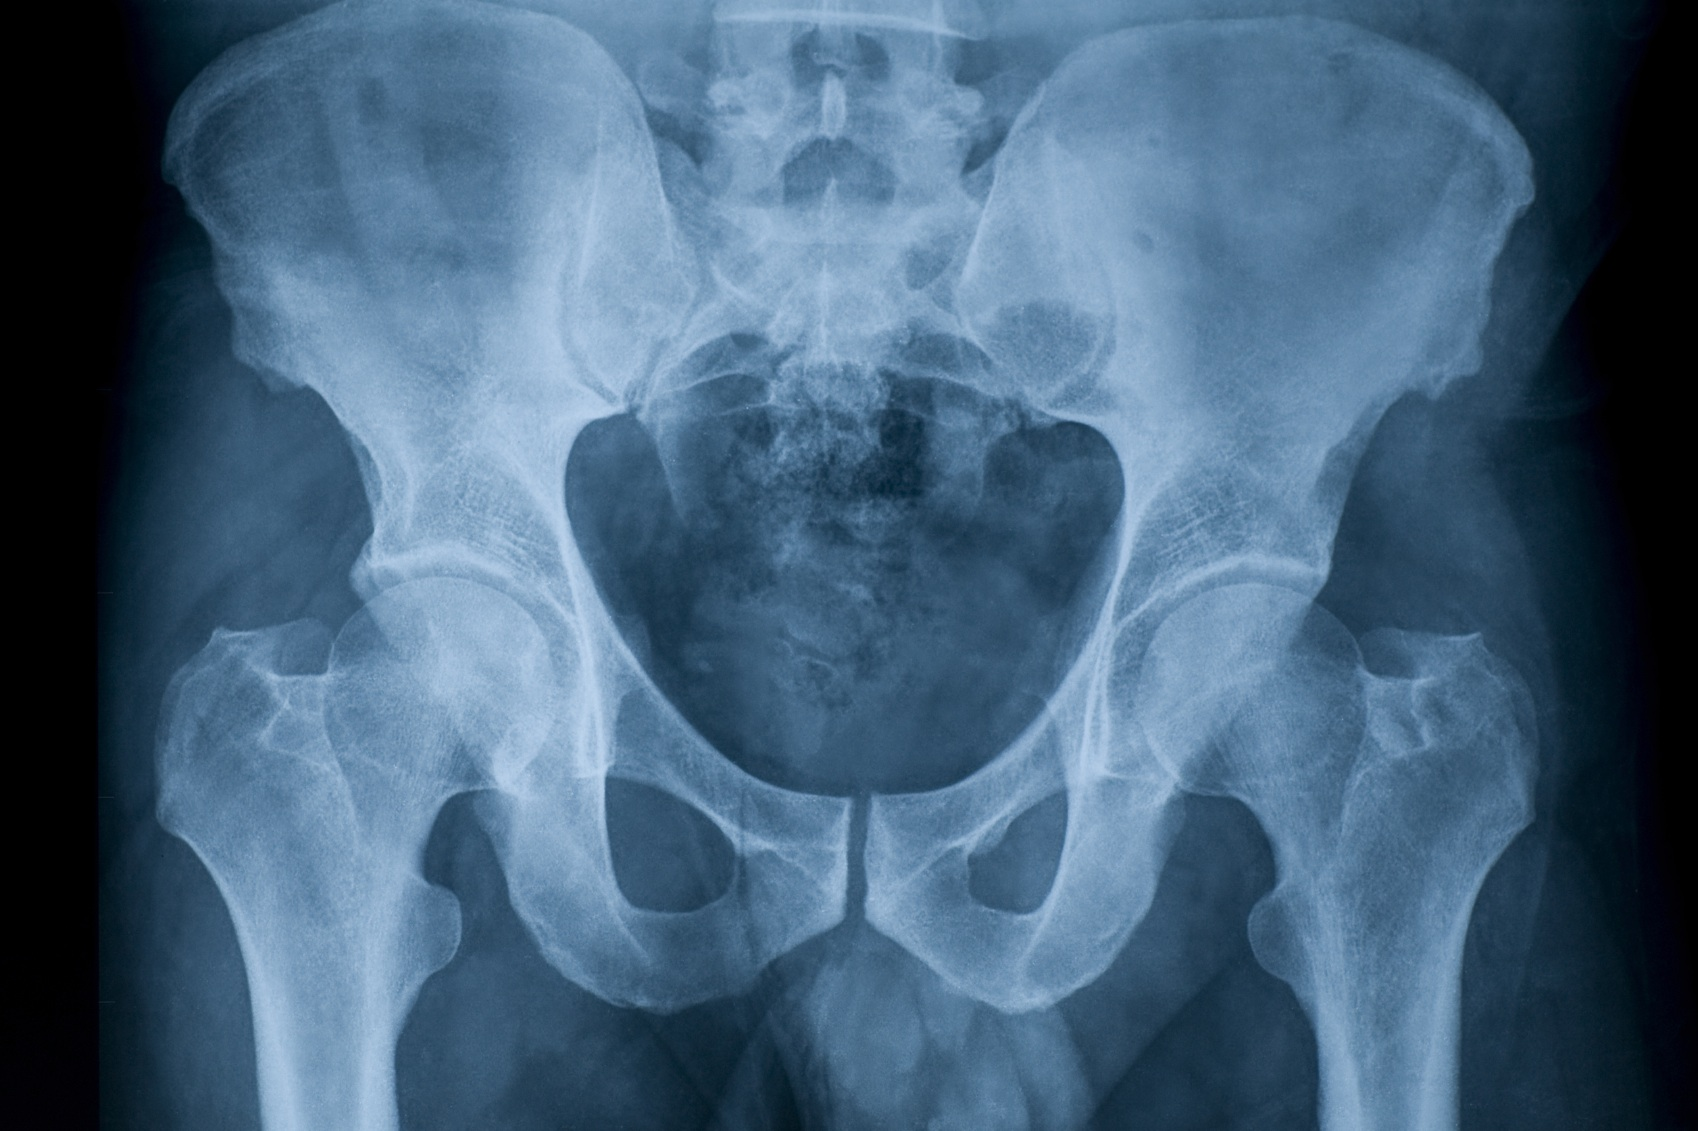 Тазобедренный сустав на рентген снимке в норме